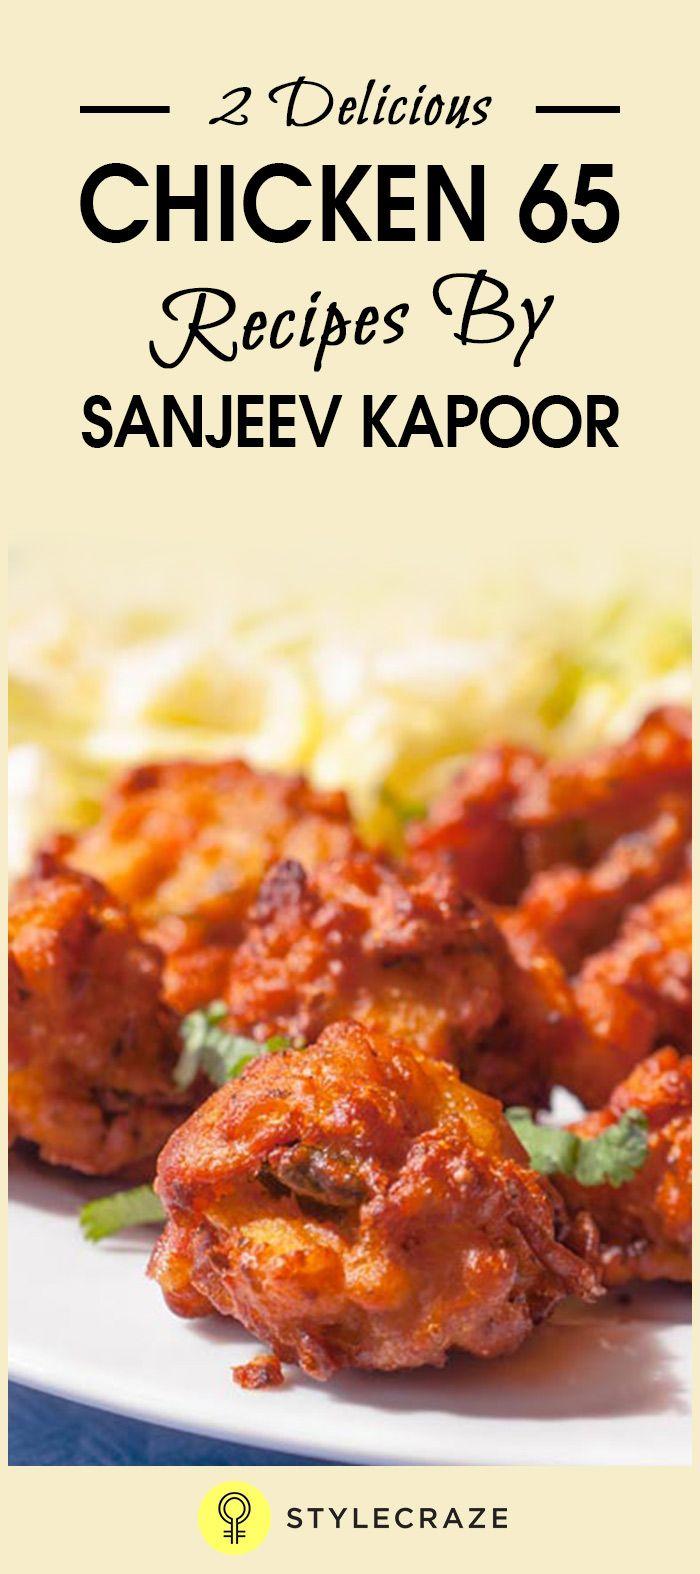 2 delicious chicken 65 recipes by sanjeev kapoor sanjeev kapoor food forumfinder Image collections